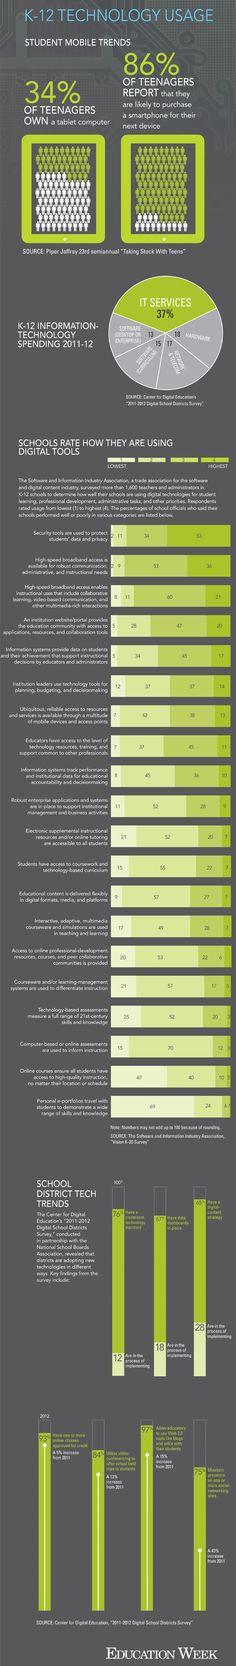 K-12 Technology usage Student mobile trends #infografia #infographic #education